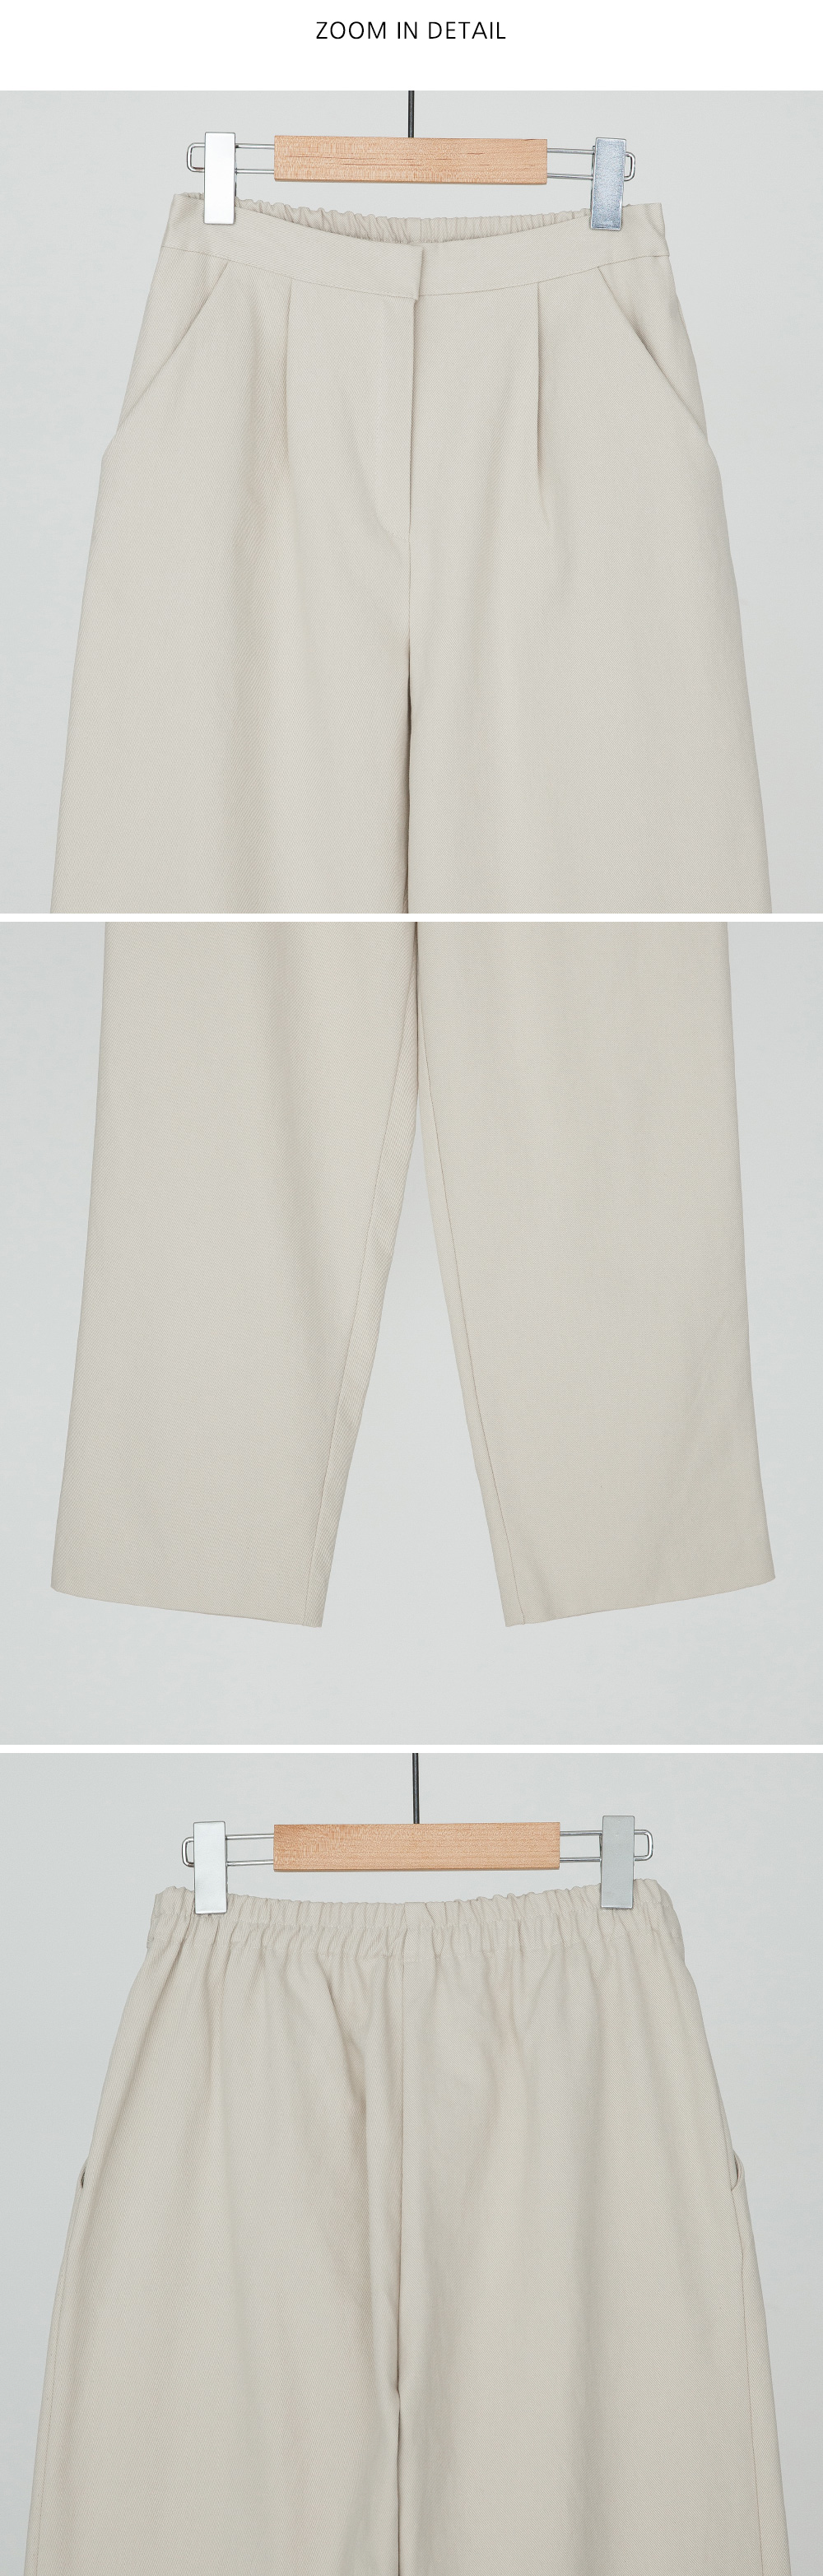 Waist Back Bending Semi Exhaust Pants-pt